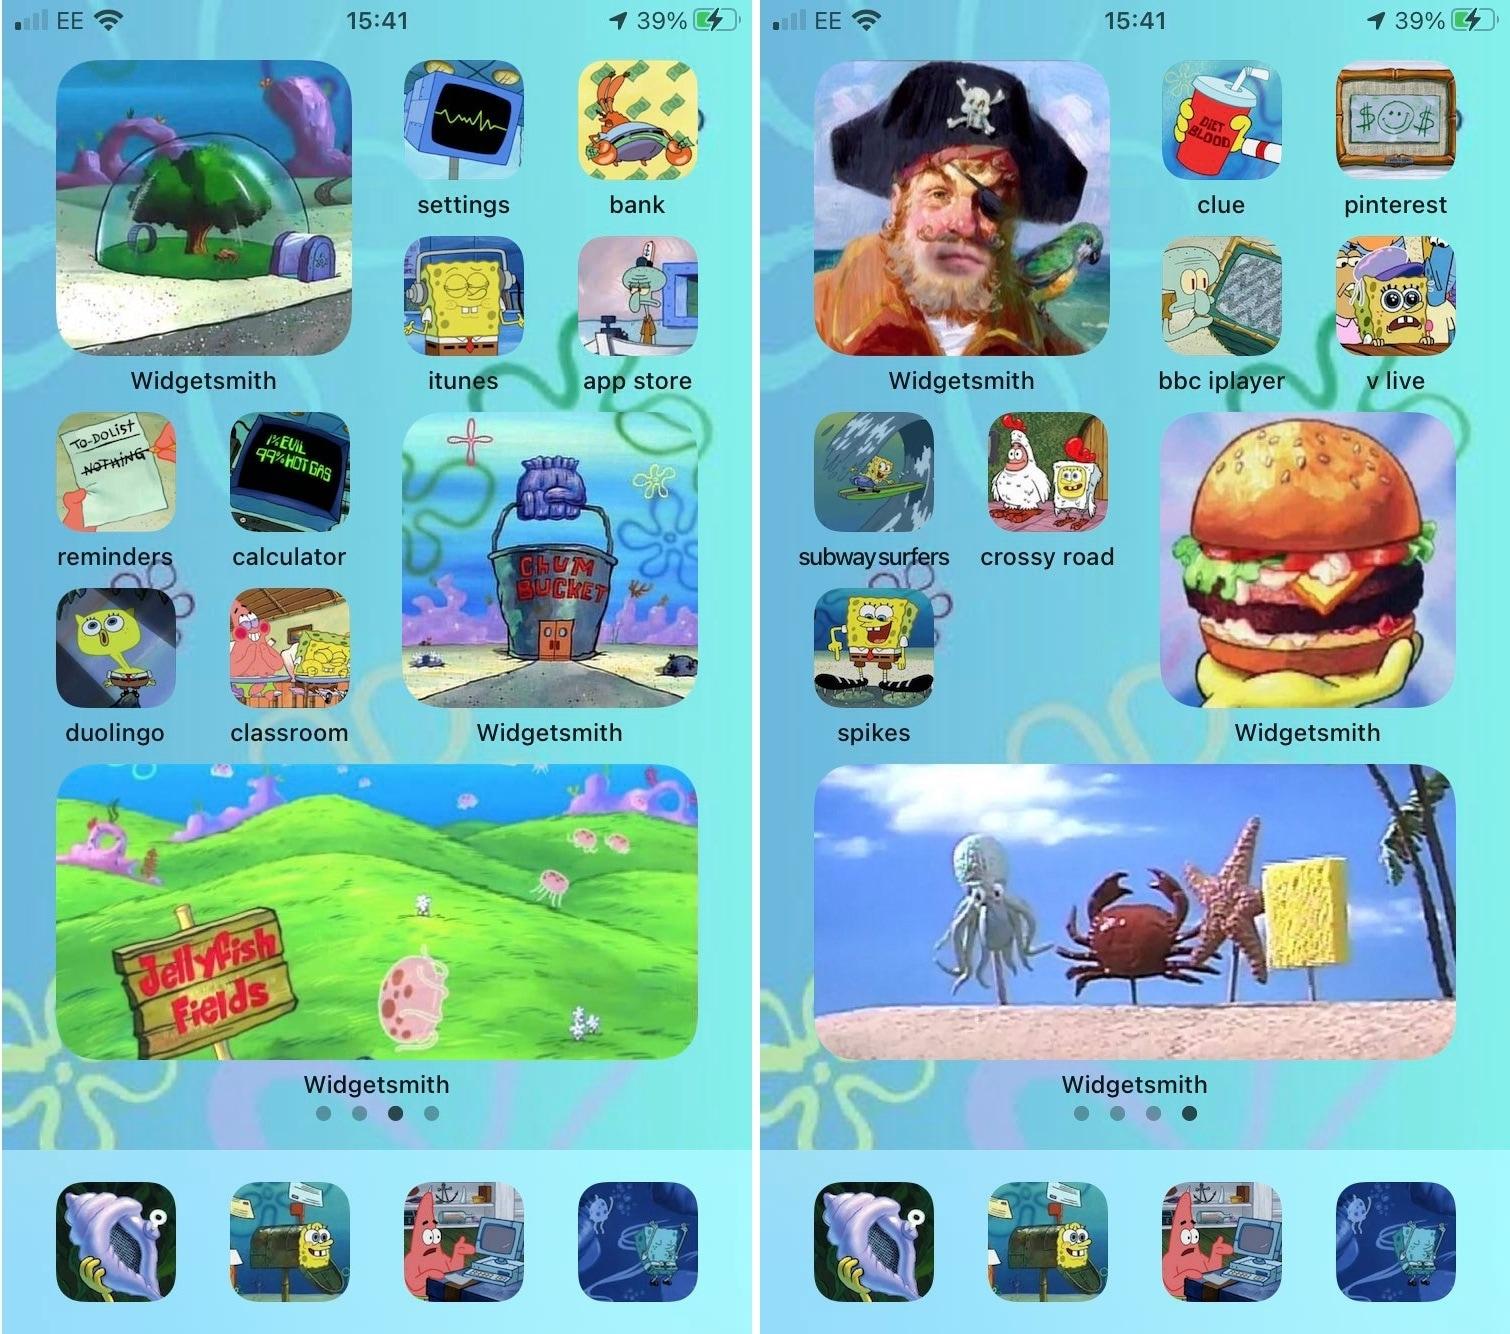 luigikartds iOS 14 Home Screen